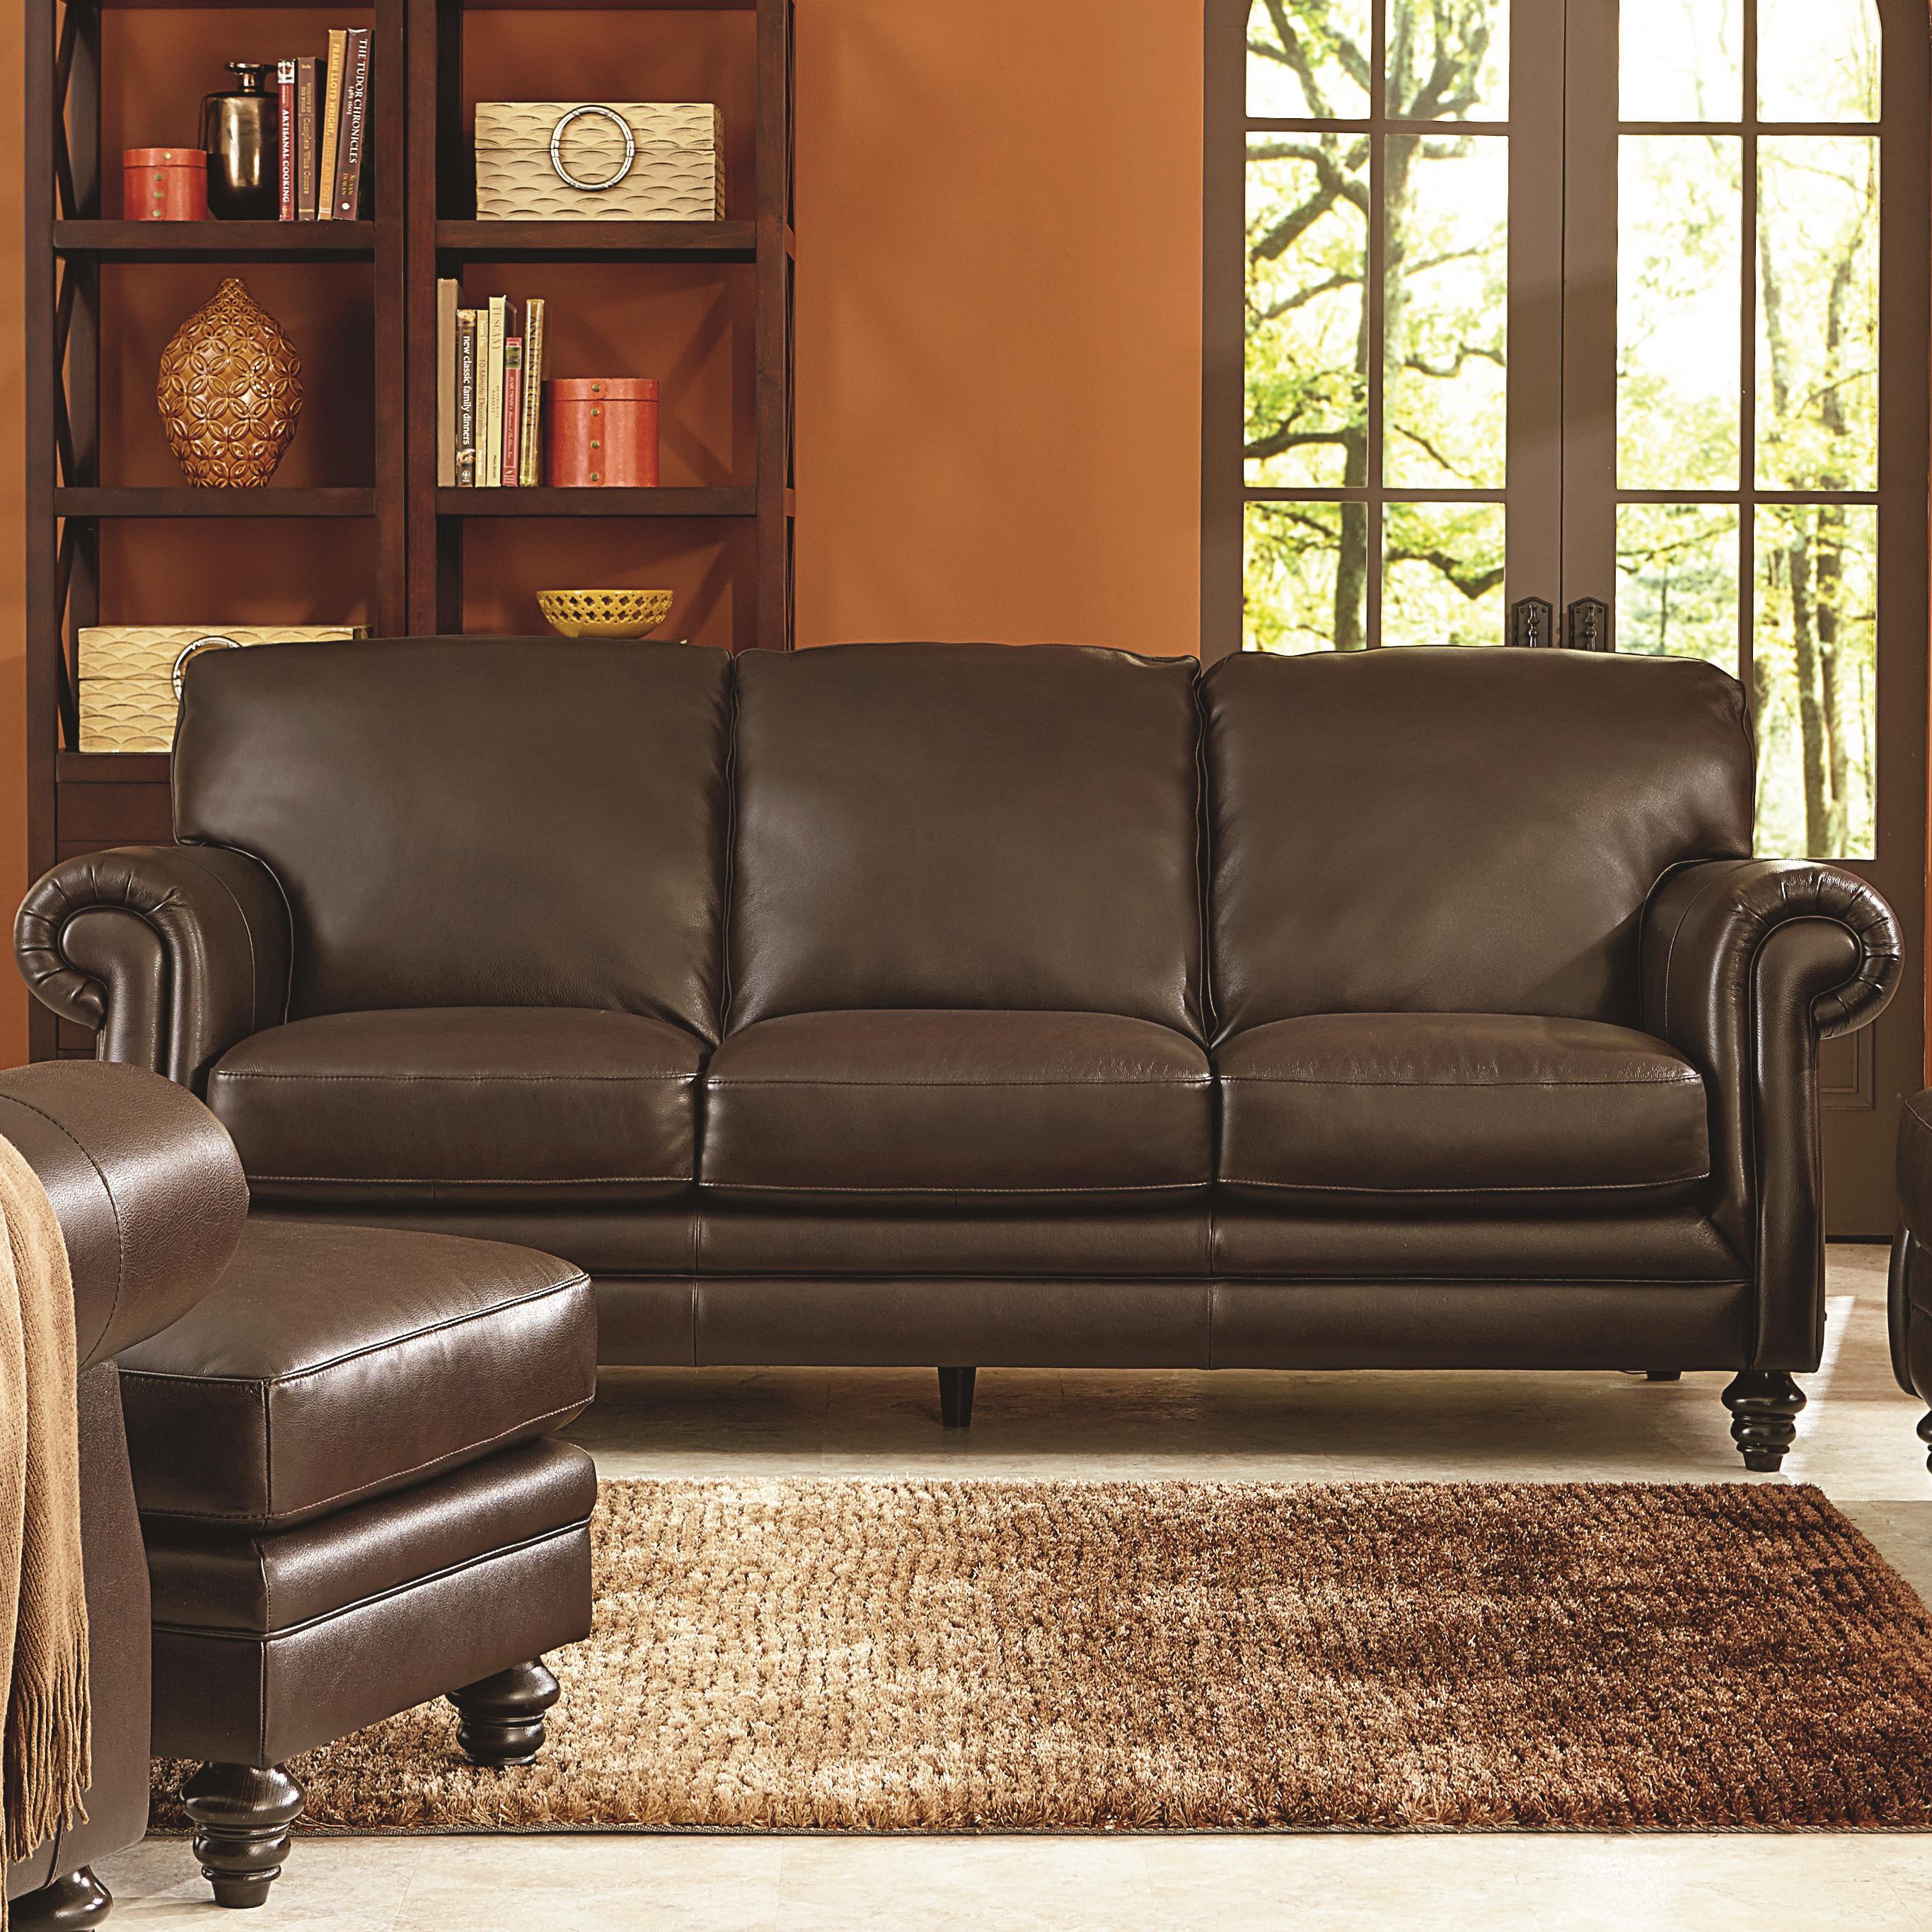 Natuzzi Editions B868 Sofa - Item Number: B868-064